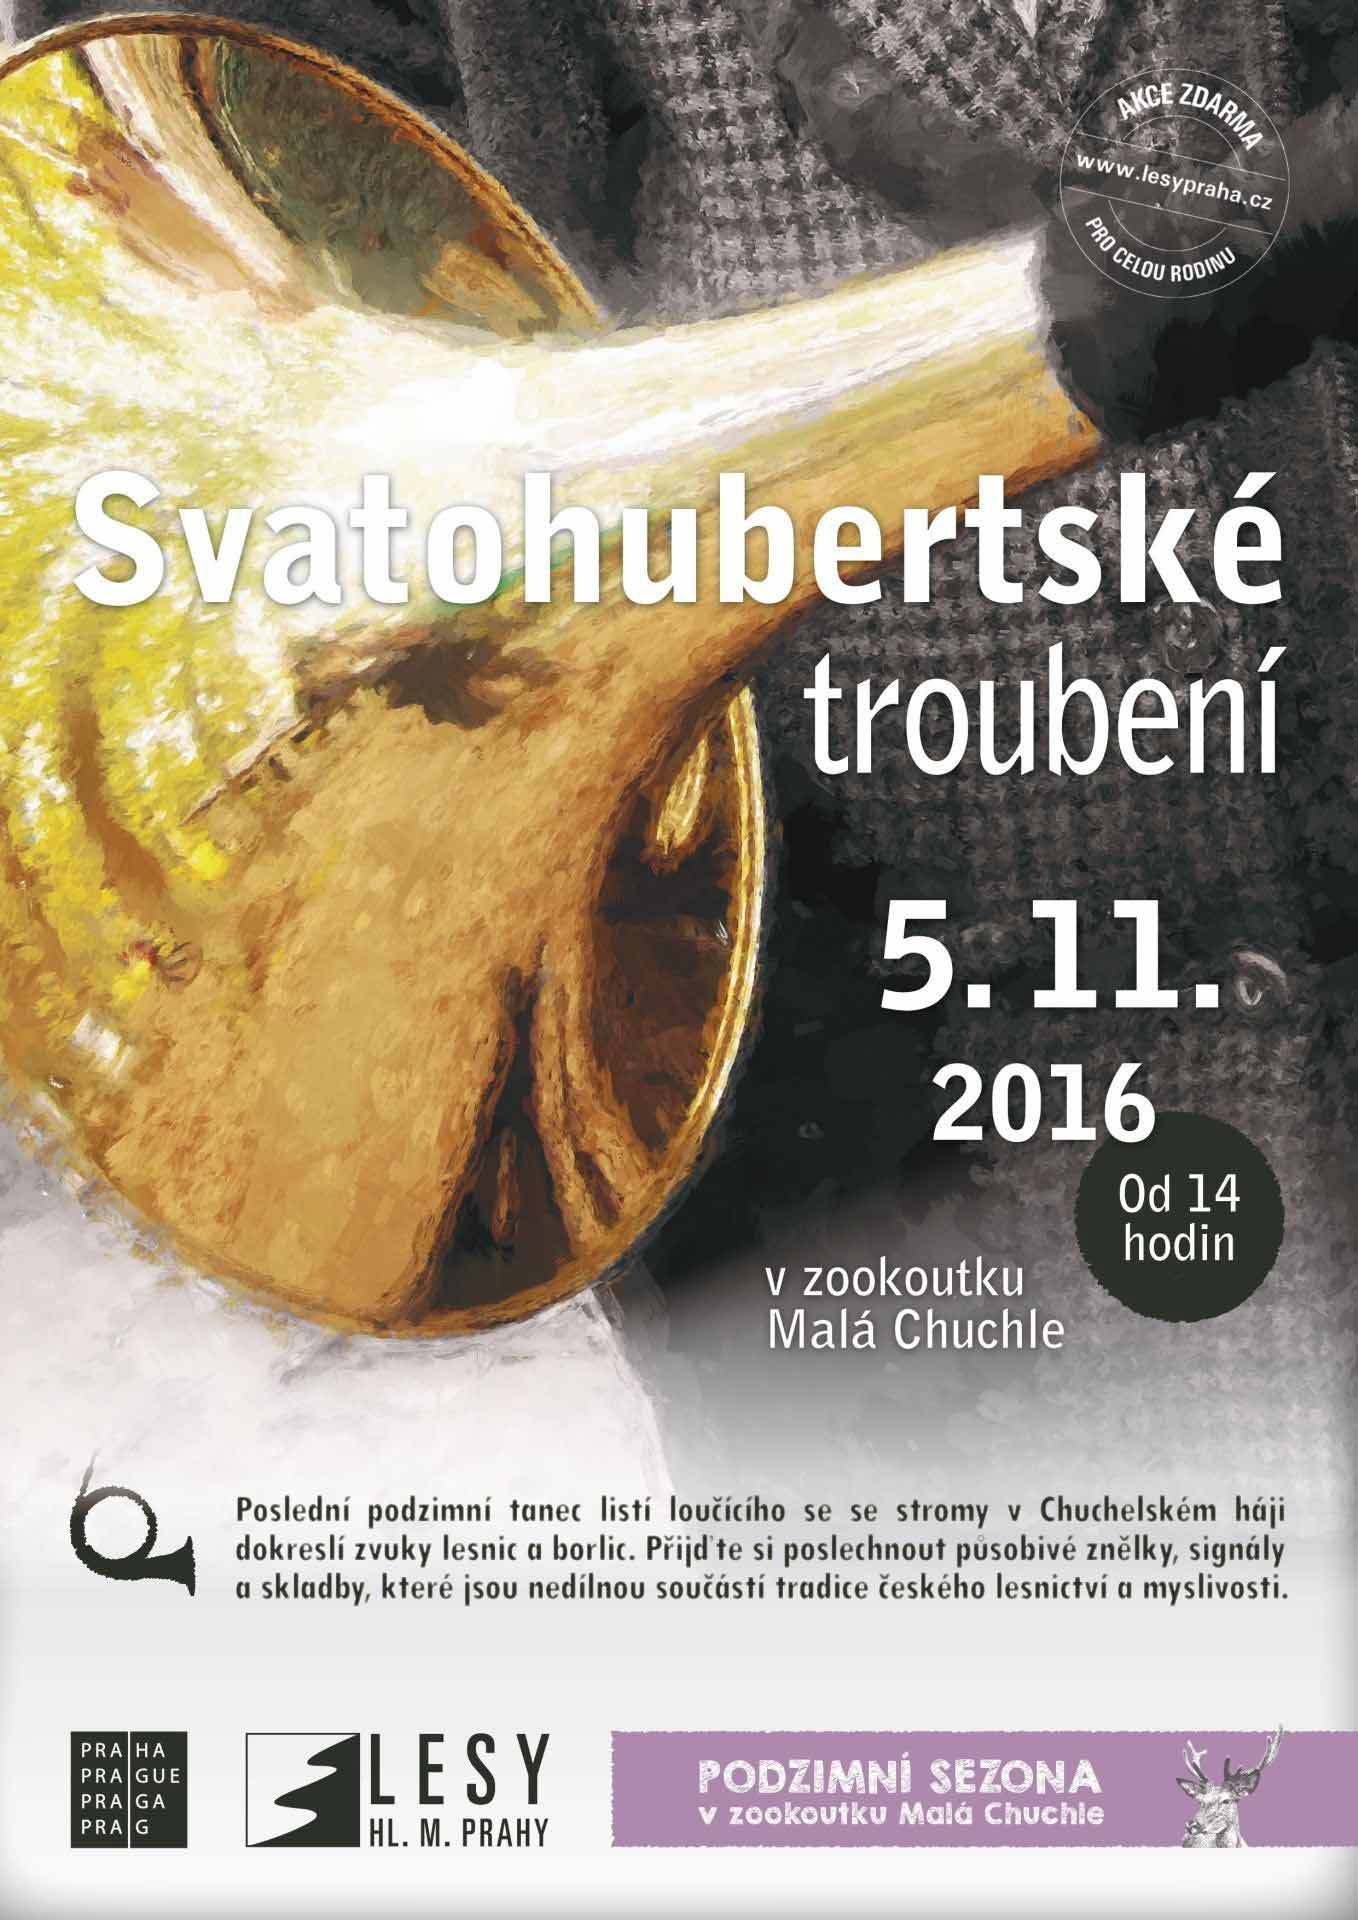 svatohubertske-troubeni-2016